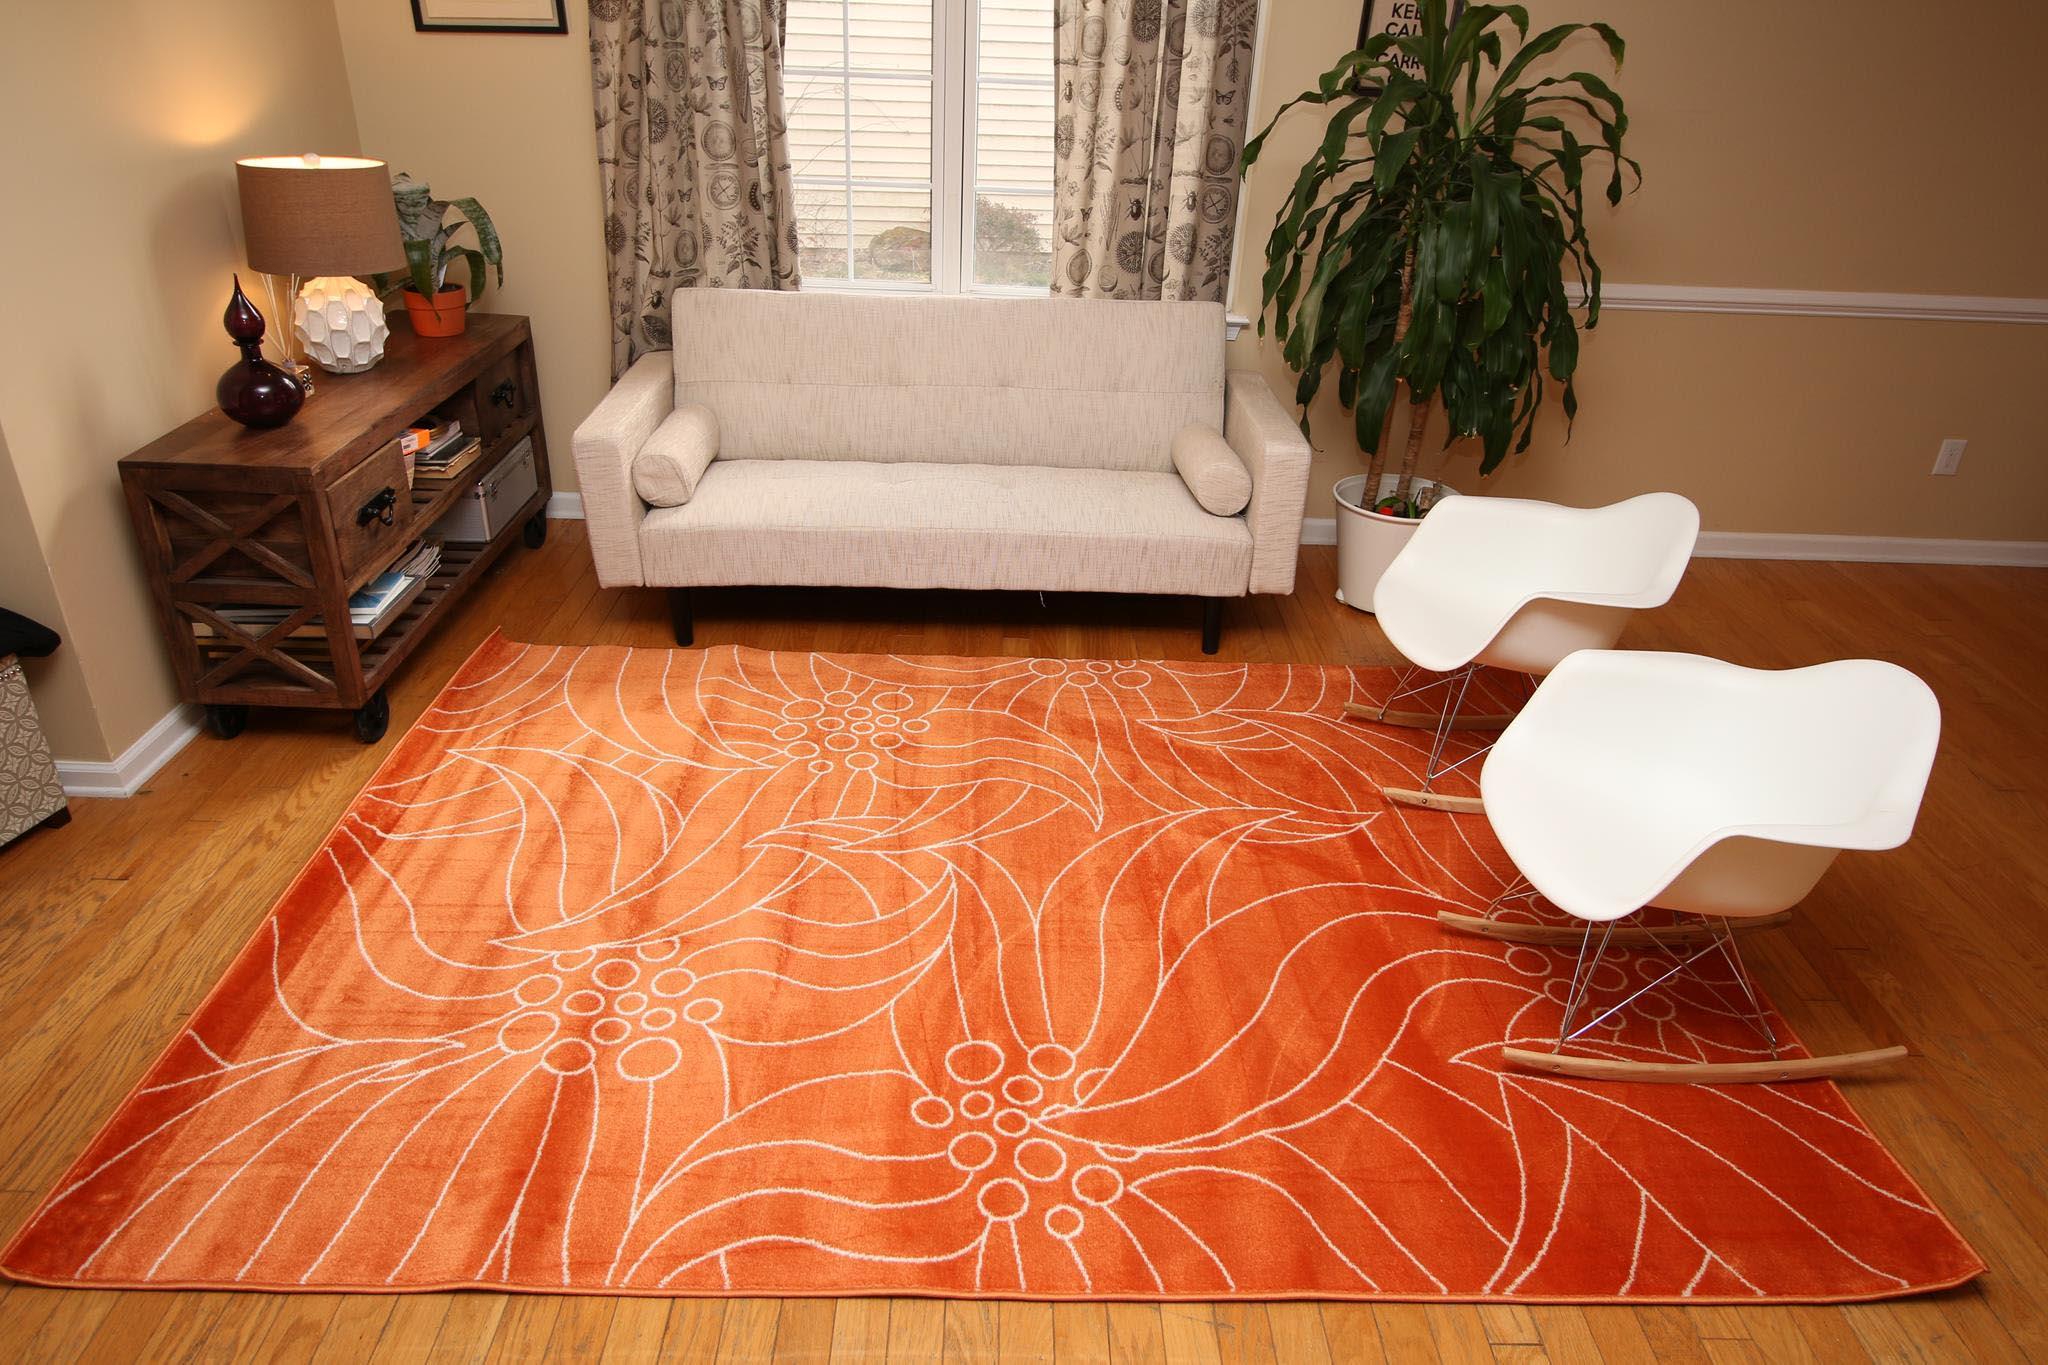 round orange area rug best decor things